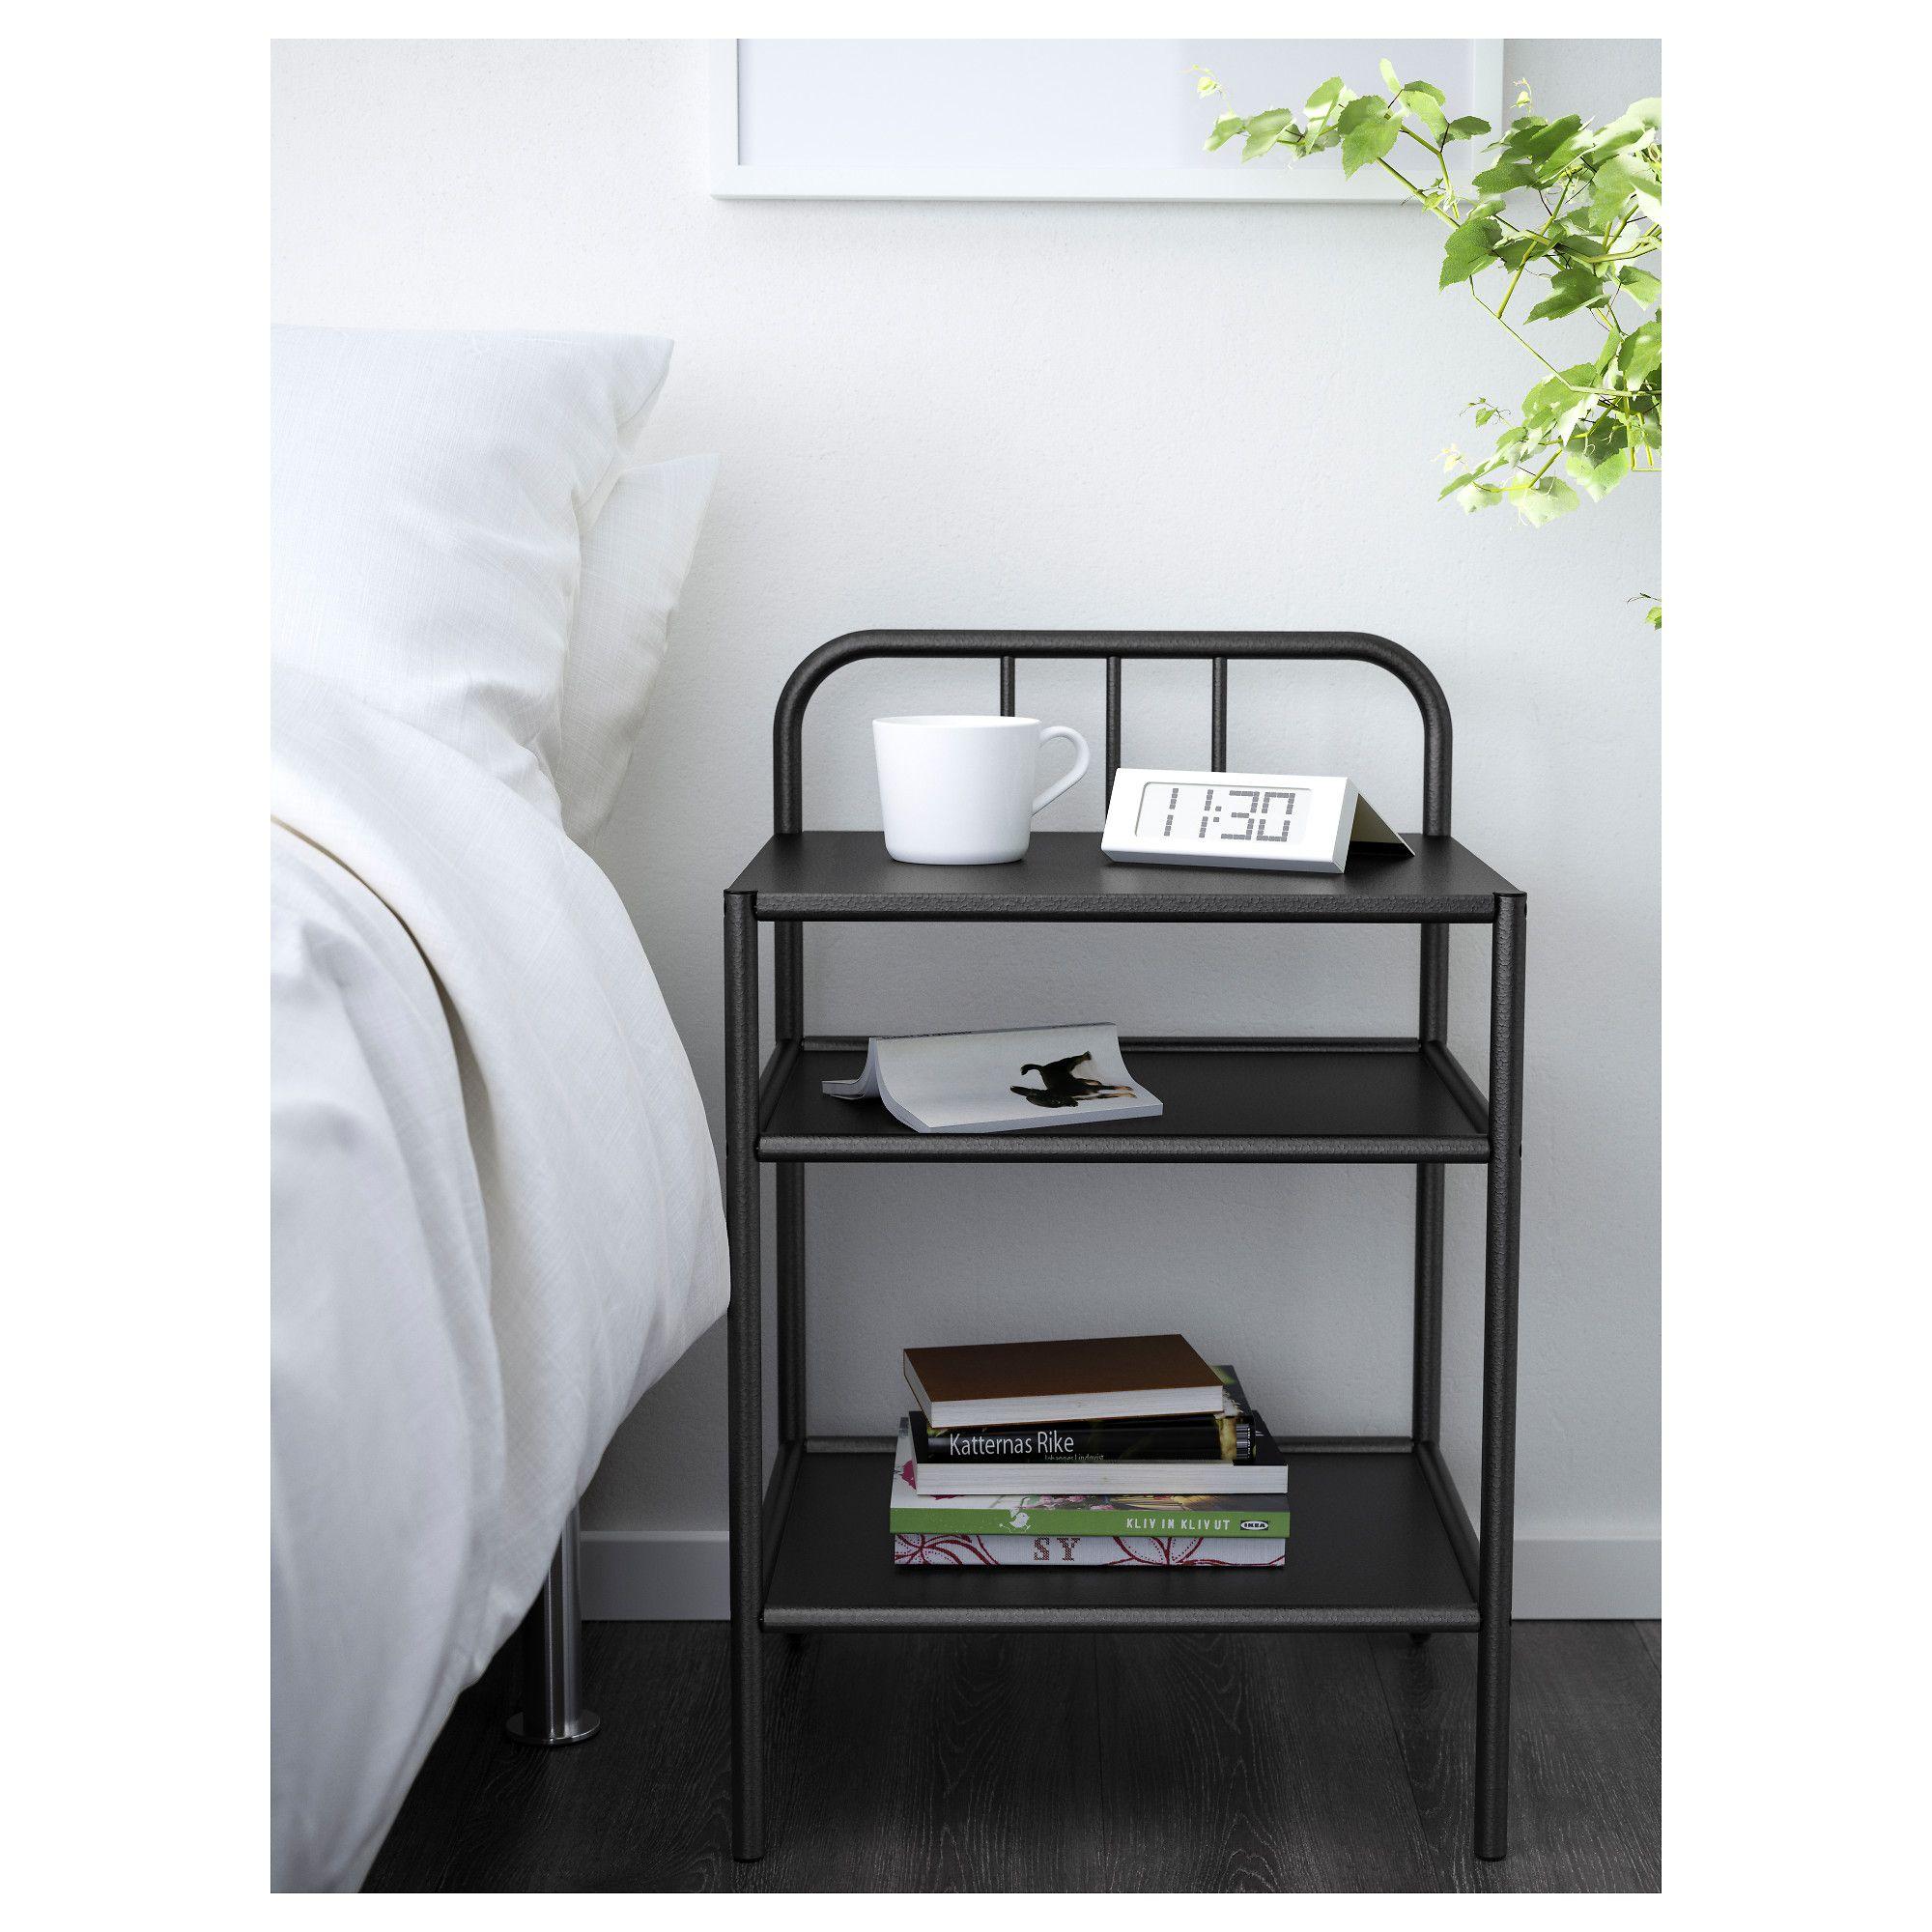 Furniture and Home Furnishings Bedside table ikea